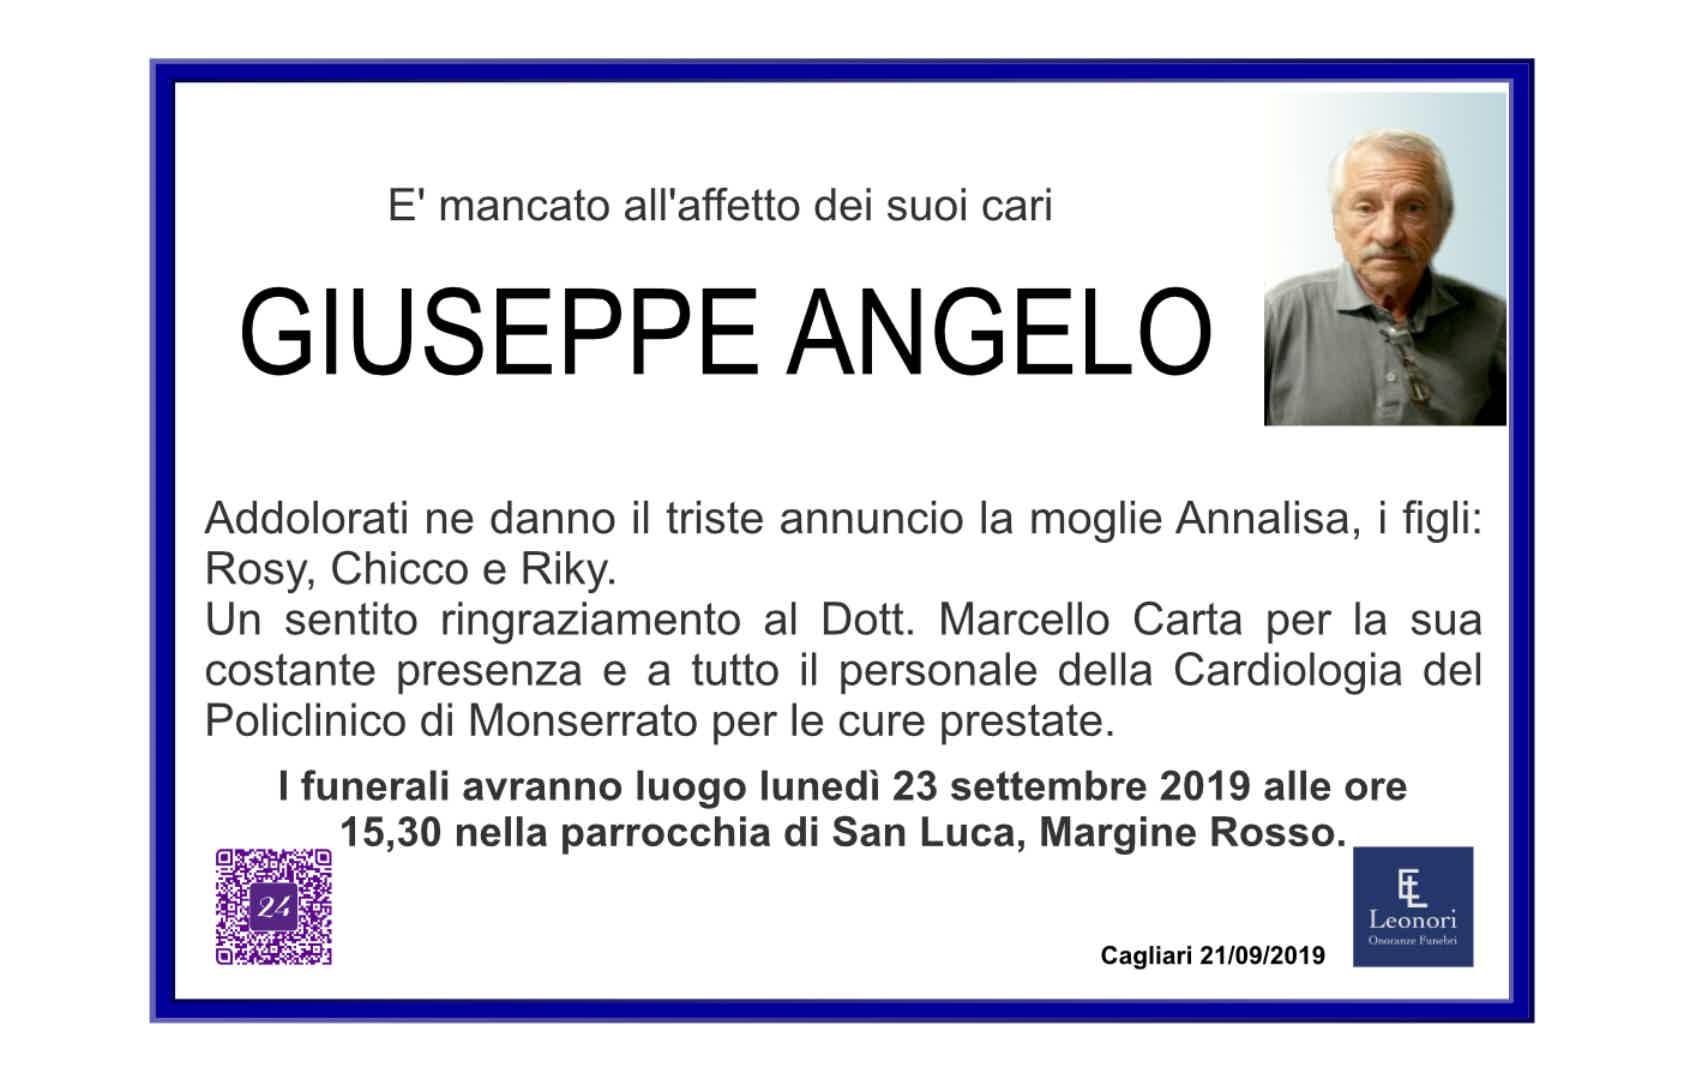 Giuseppe Angelo